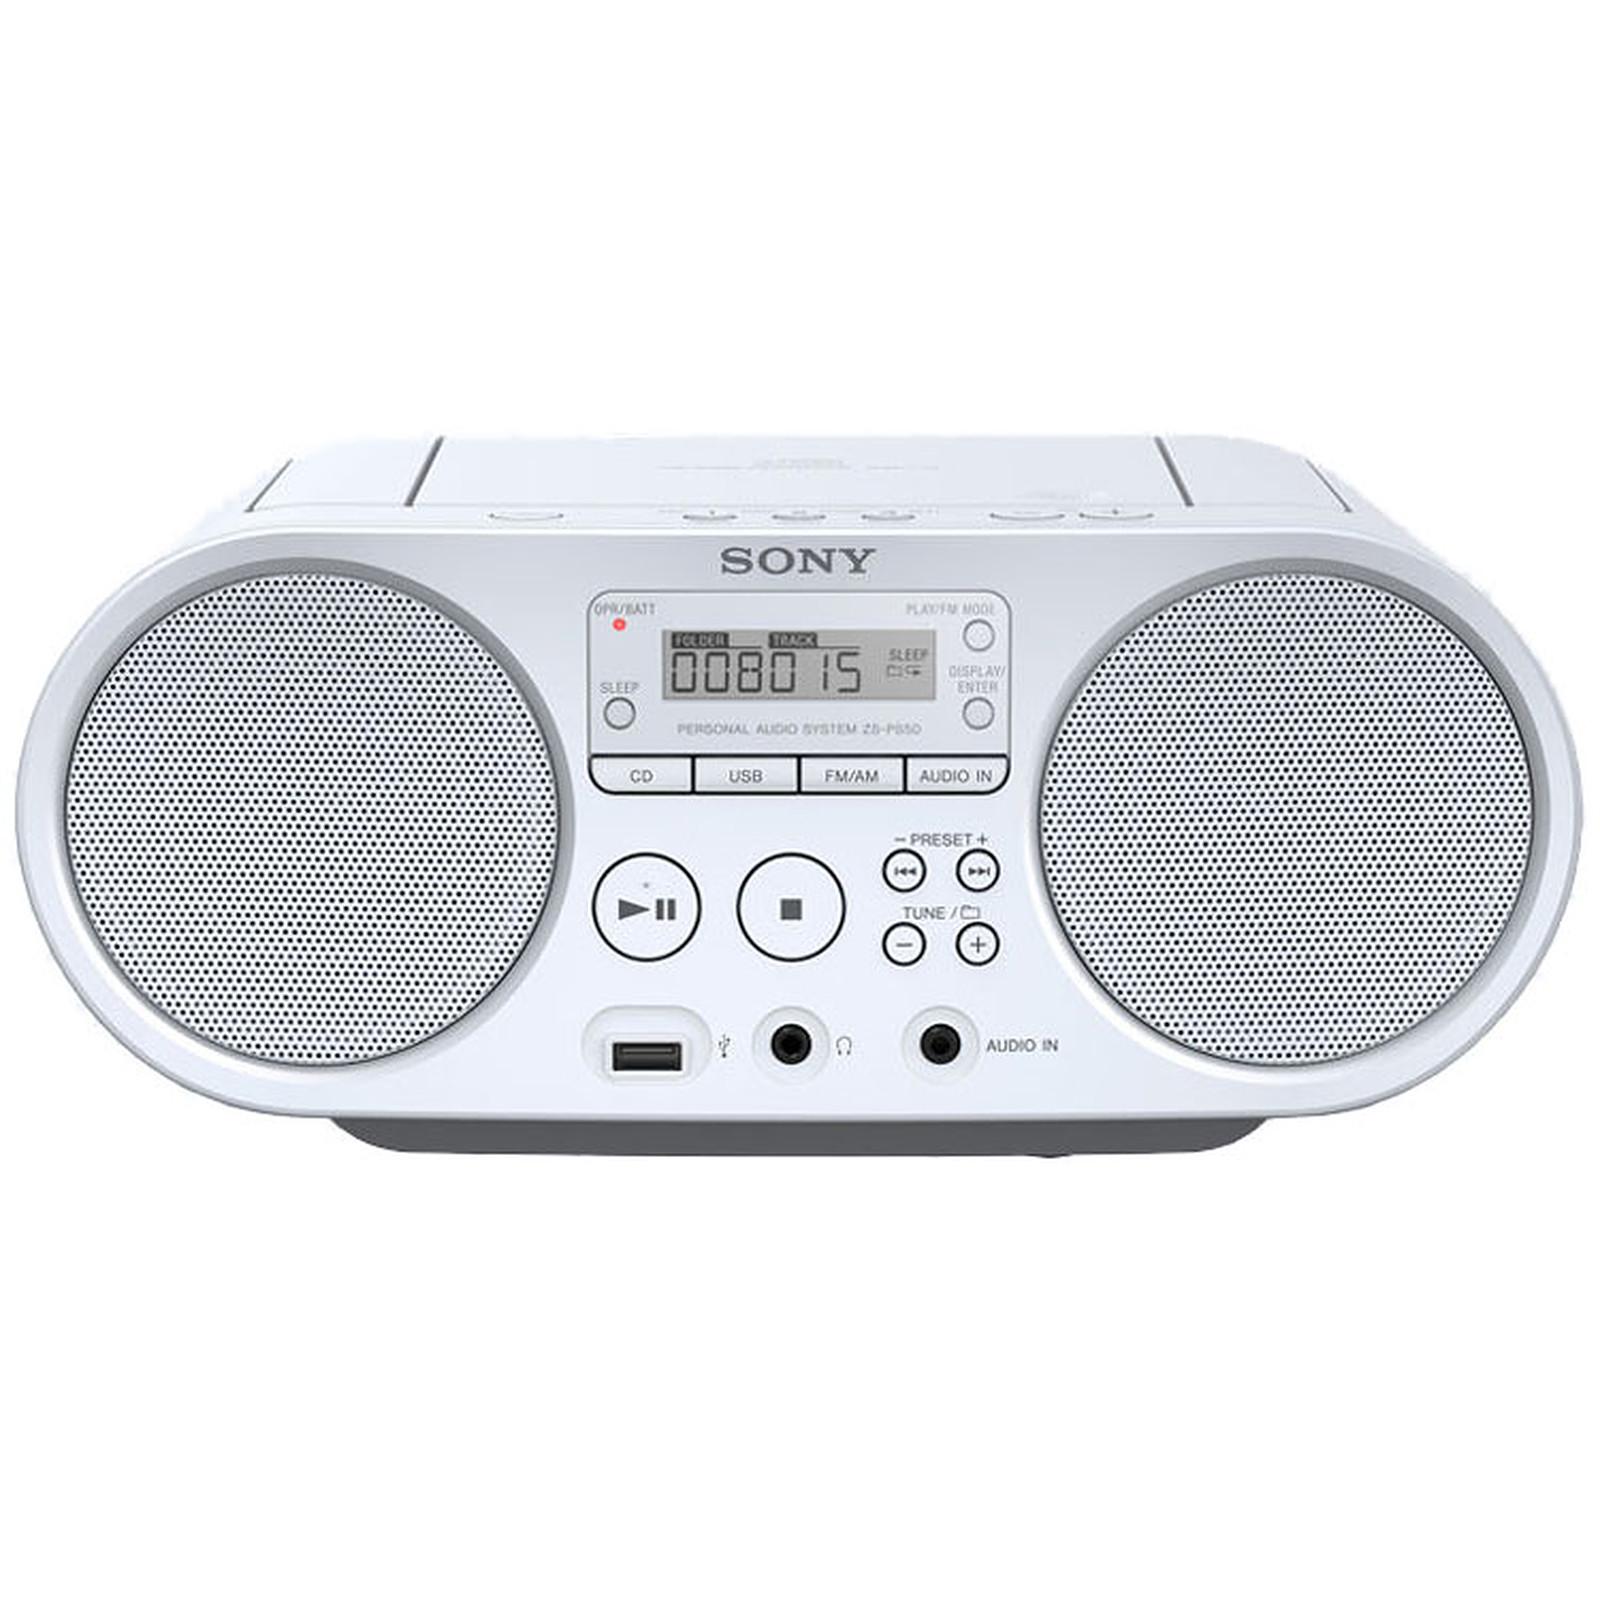 ad6aa3eafa9299 Radio CD portable MP3 WMA USB avec Tuner FM AM. Sony ZS-PS50 Blanc